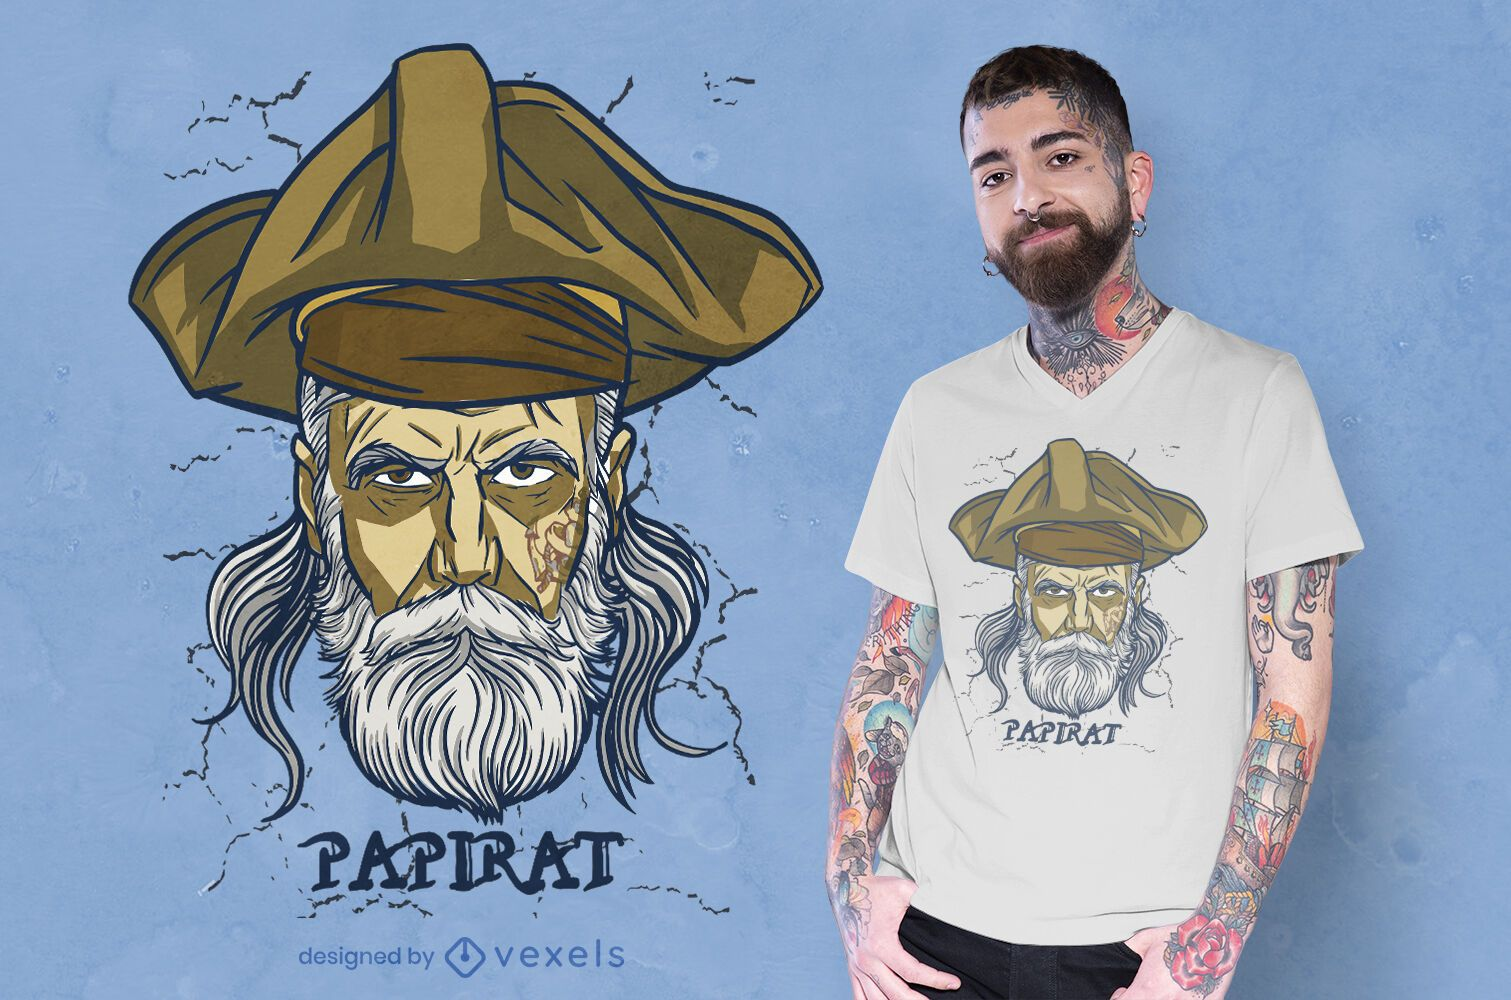 Diseño de camiseta de juego de palabras en alemán de papá pirata